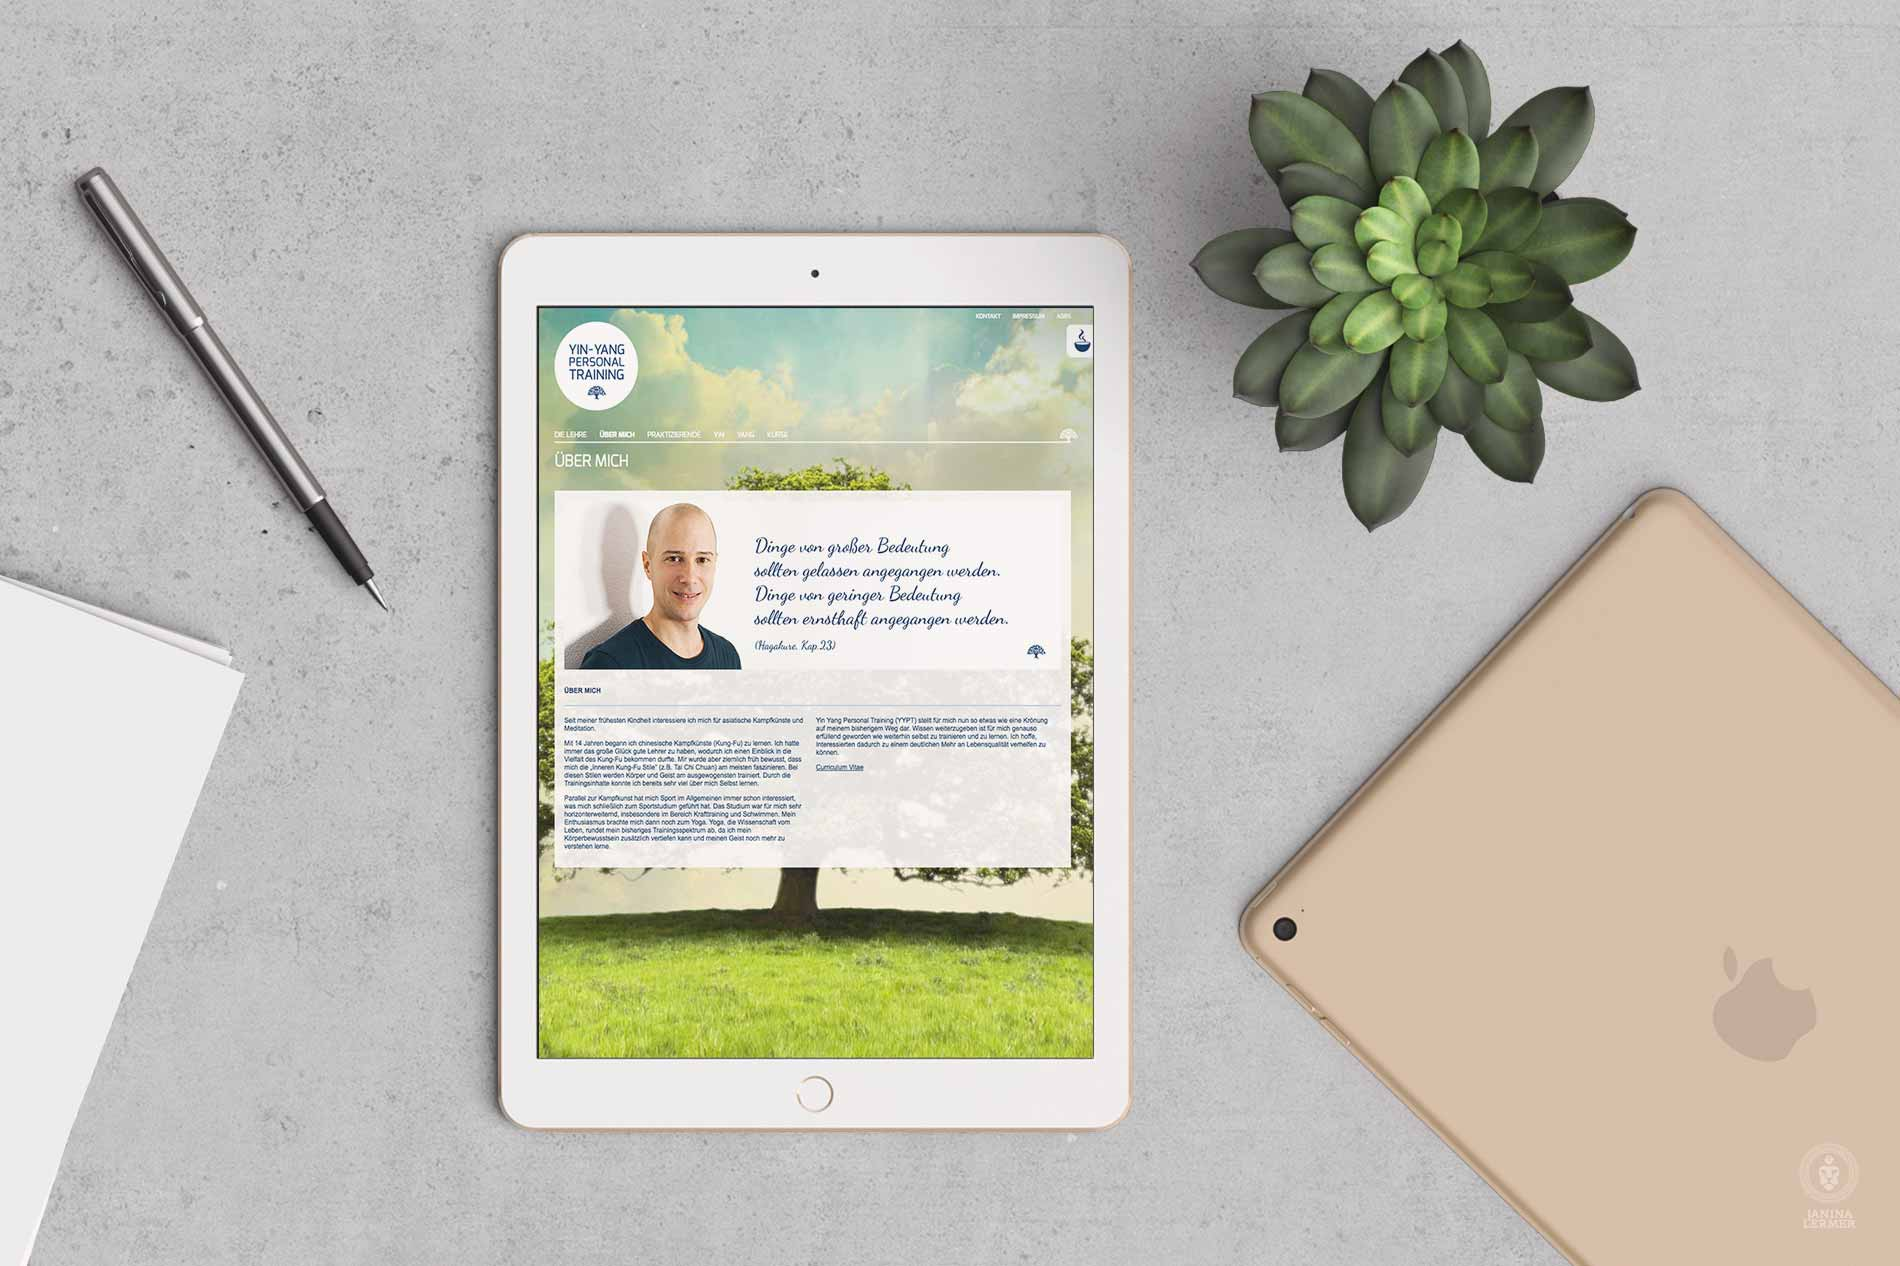 Webseitenkonzept-Webseitengestaltung-Webdesign-Yin-Yang-PersonalTrainer-Ulrich-Lampert-Ipad-Ueber-About